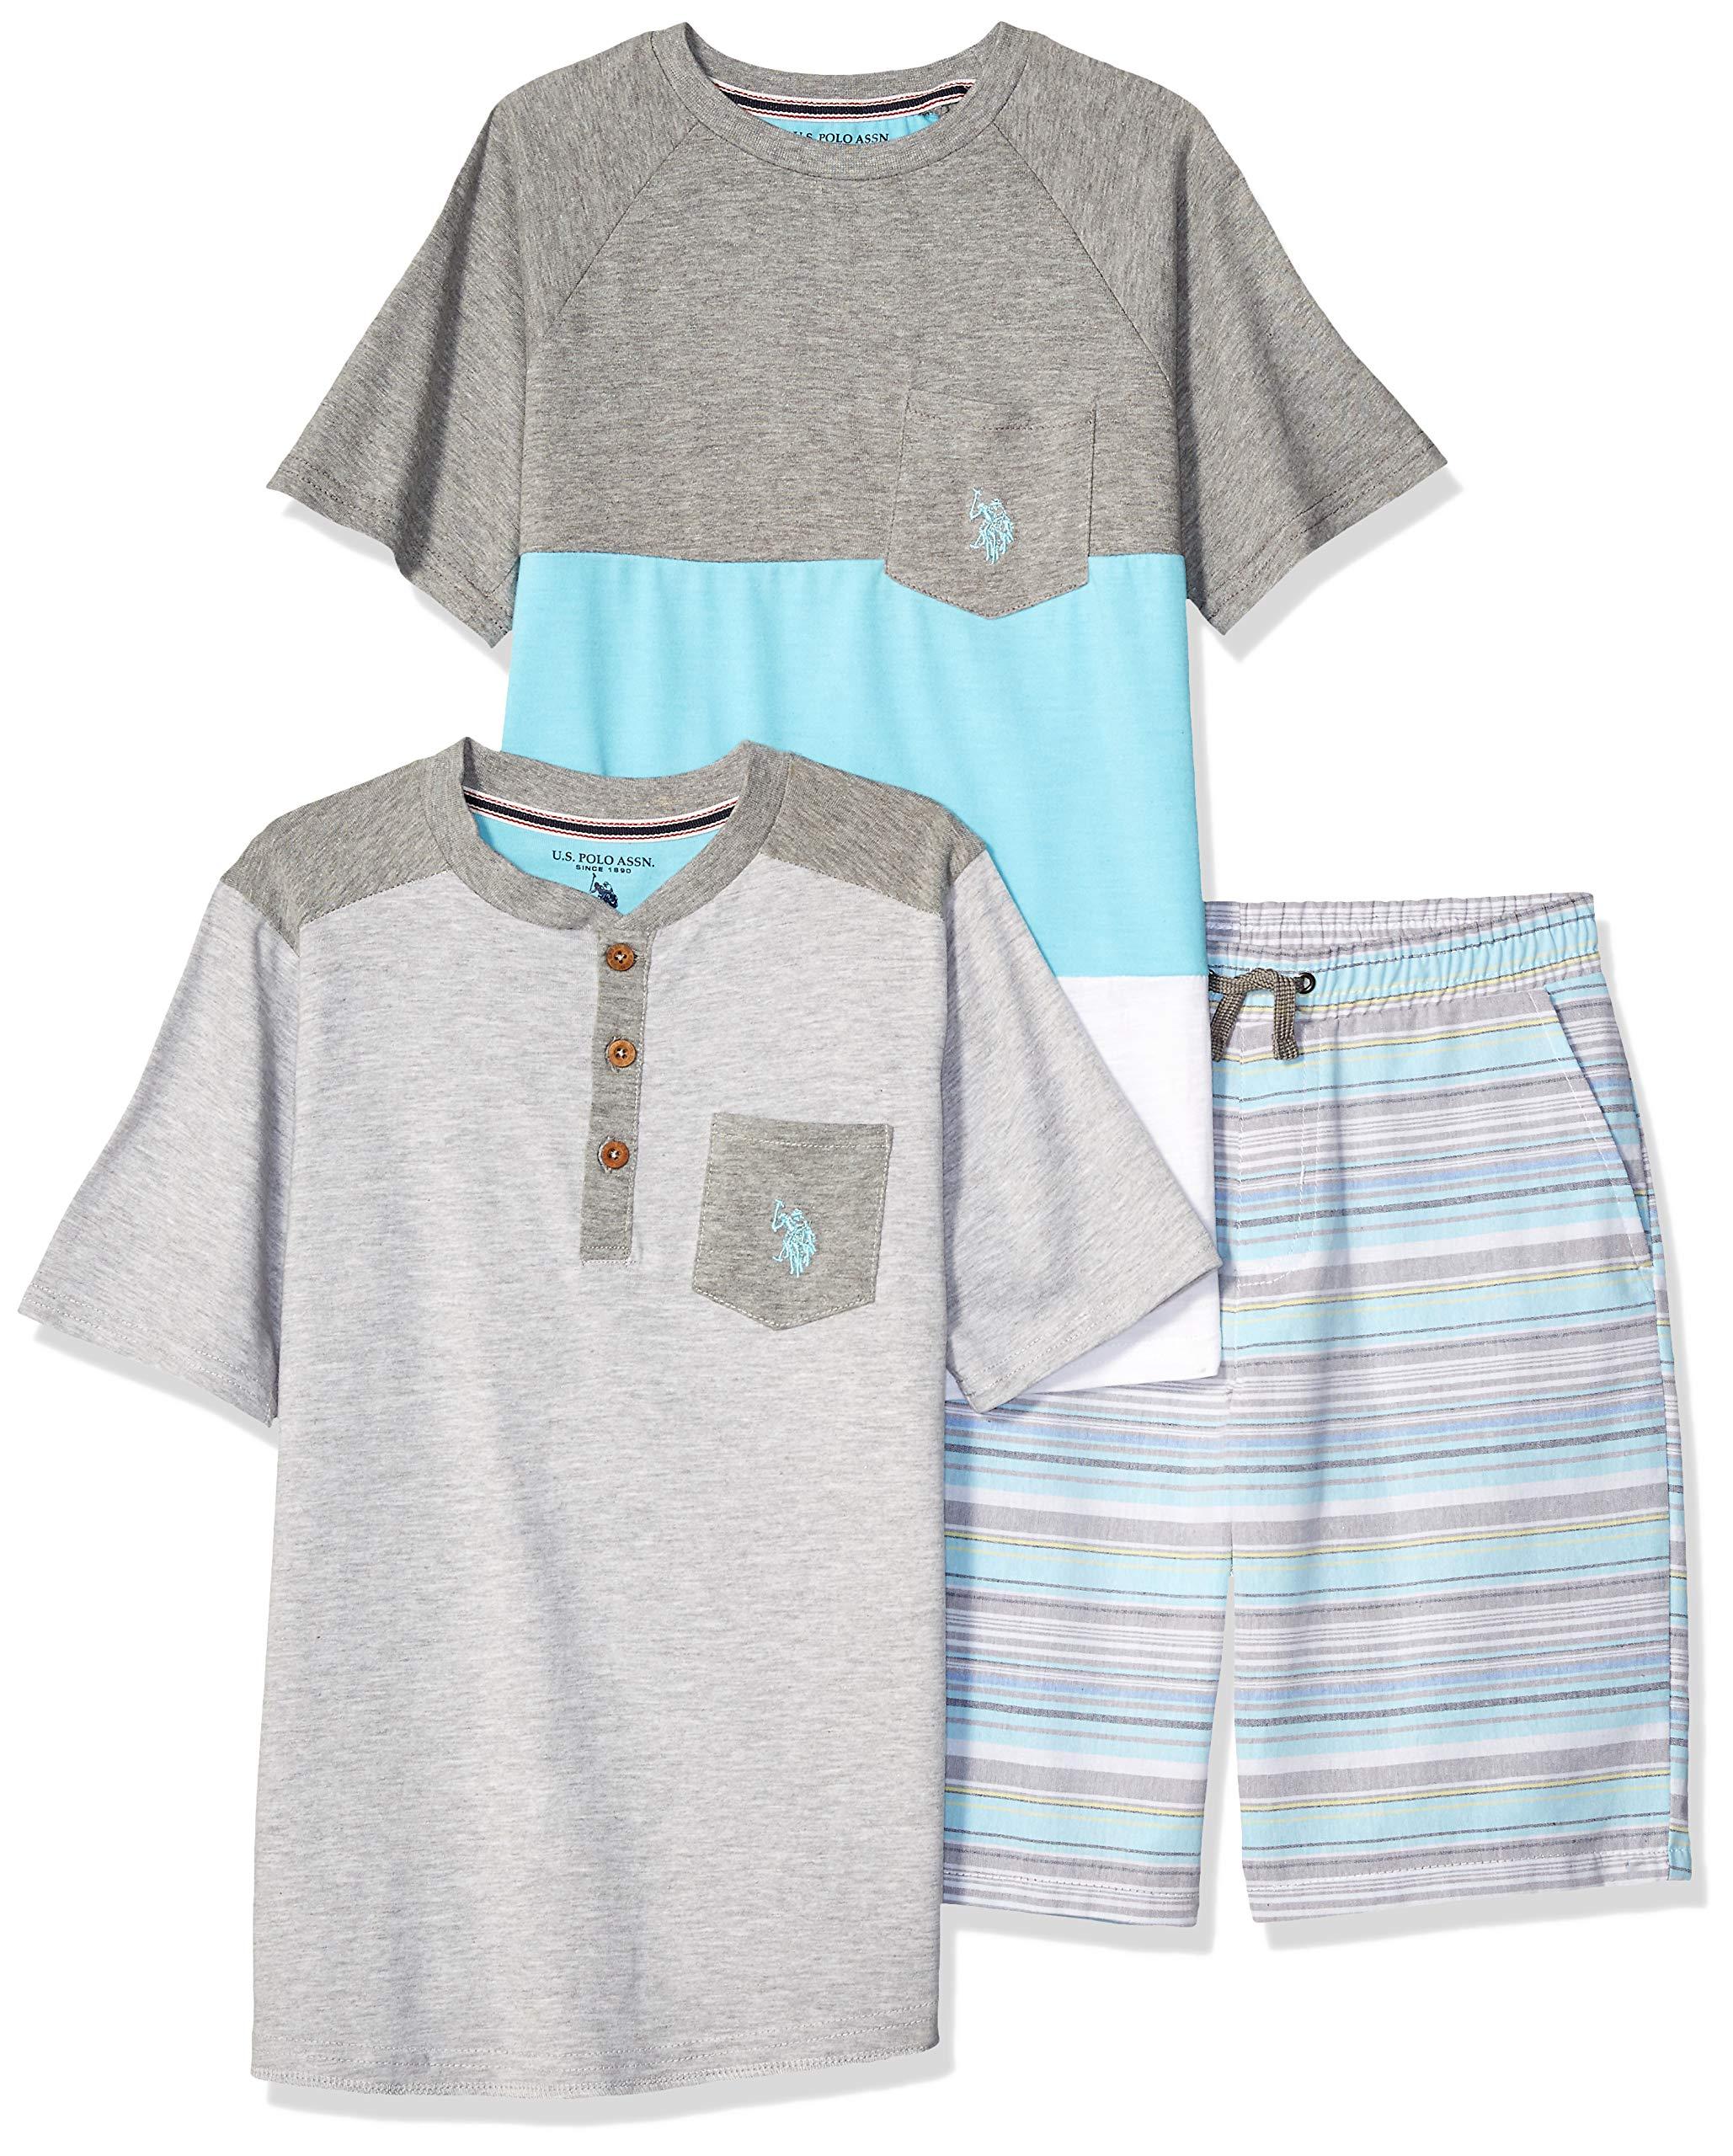 U.S. Polo Assn. Boys' Little Sleeve T-Shirt, Henley, and Short Set, Light Teal Stripe Multi Plaid, 5/6